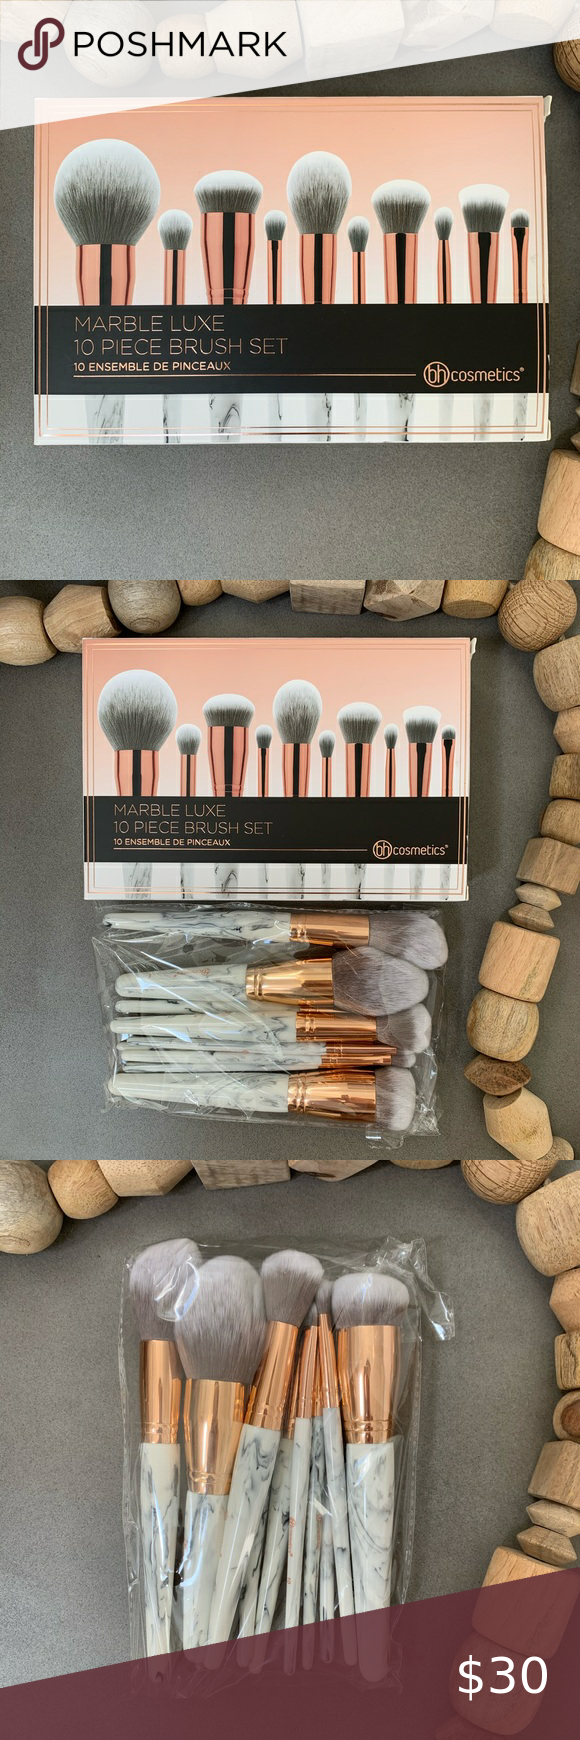 Bh Cosmetics 10 Piece Marble Brush Set In 2020 Bh Cosmetics Brush Set 10 Things